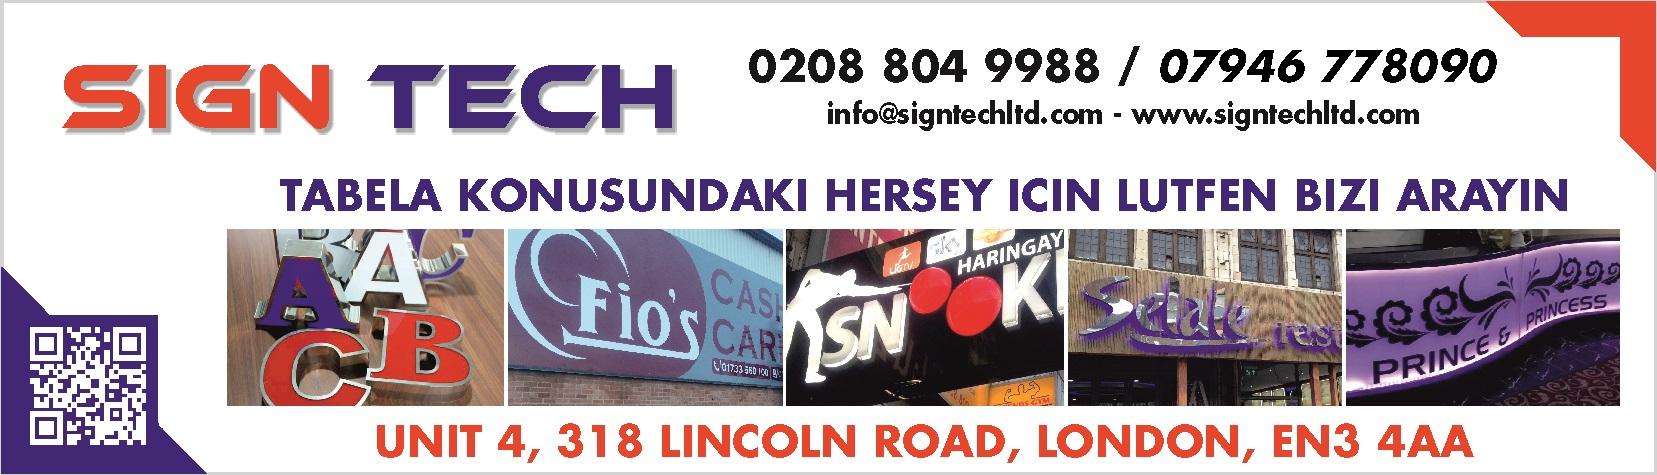 LONDON SIGN TECH